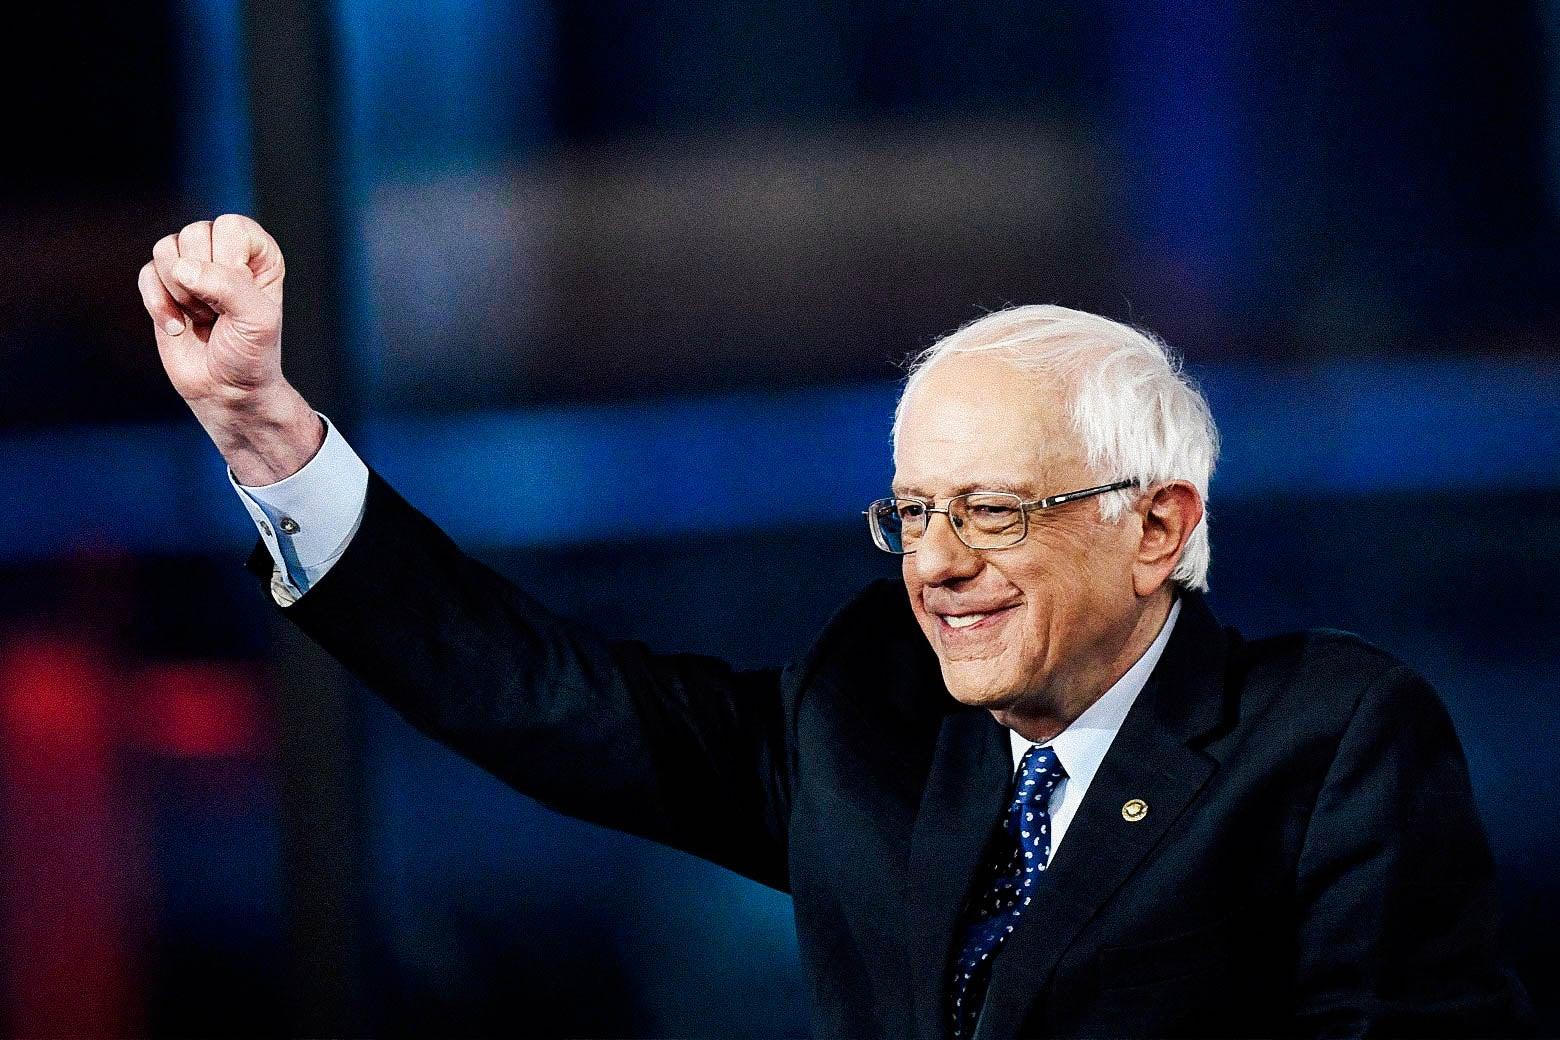 Sanders smiles and raises his fist onstage.